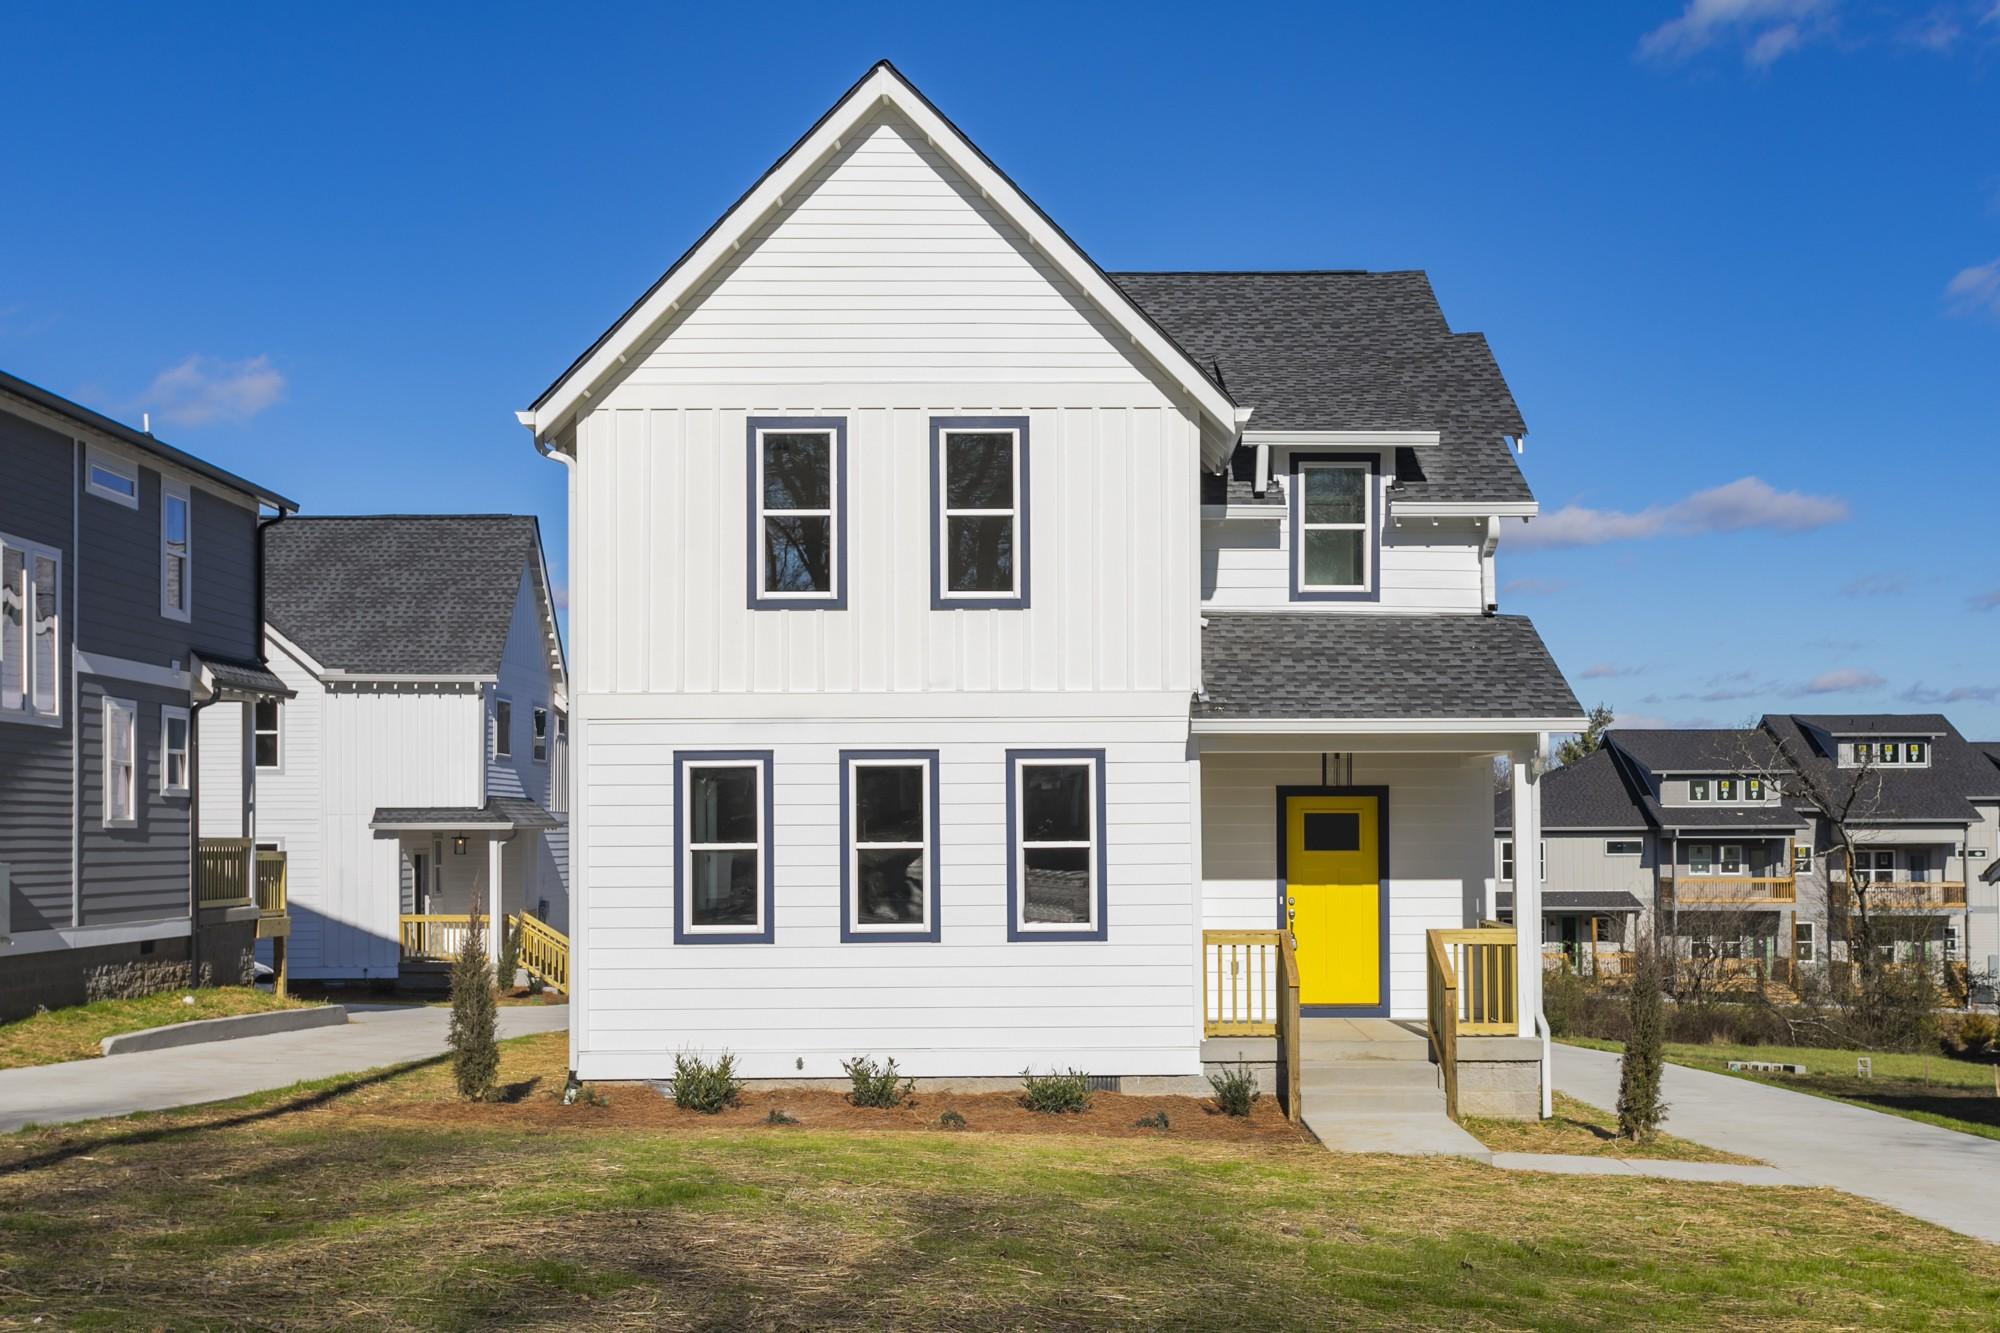 6374A Ivy St, Nashville, TN 37209 - Nashville, TN real estate listing